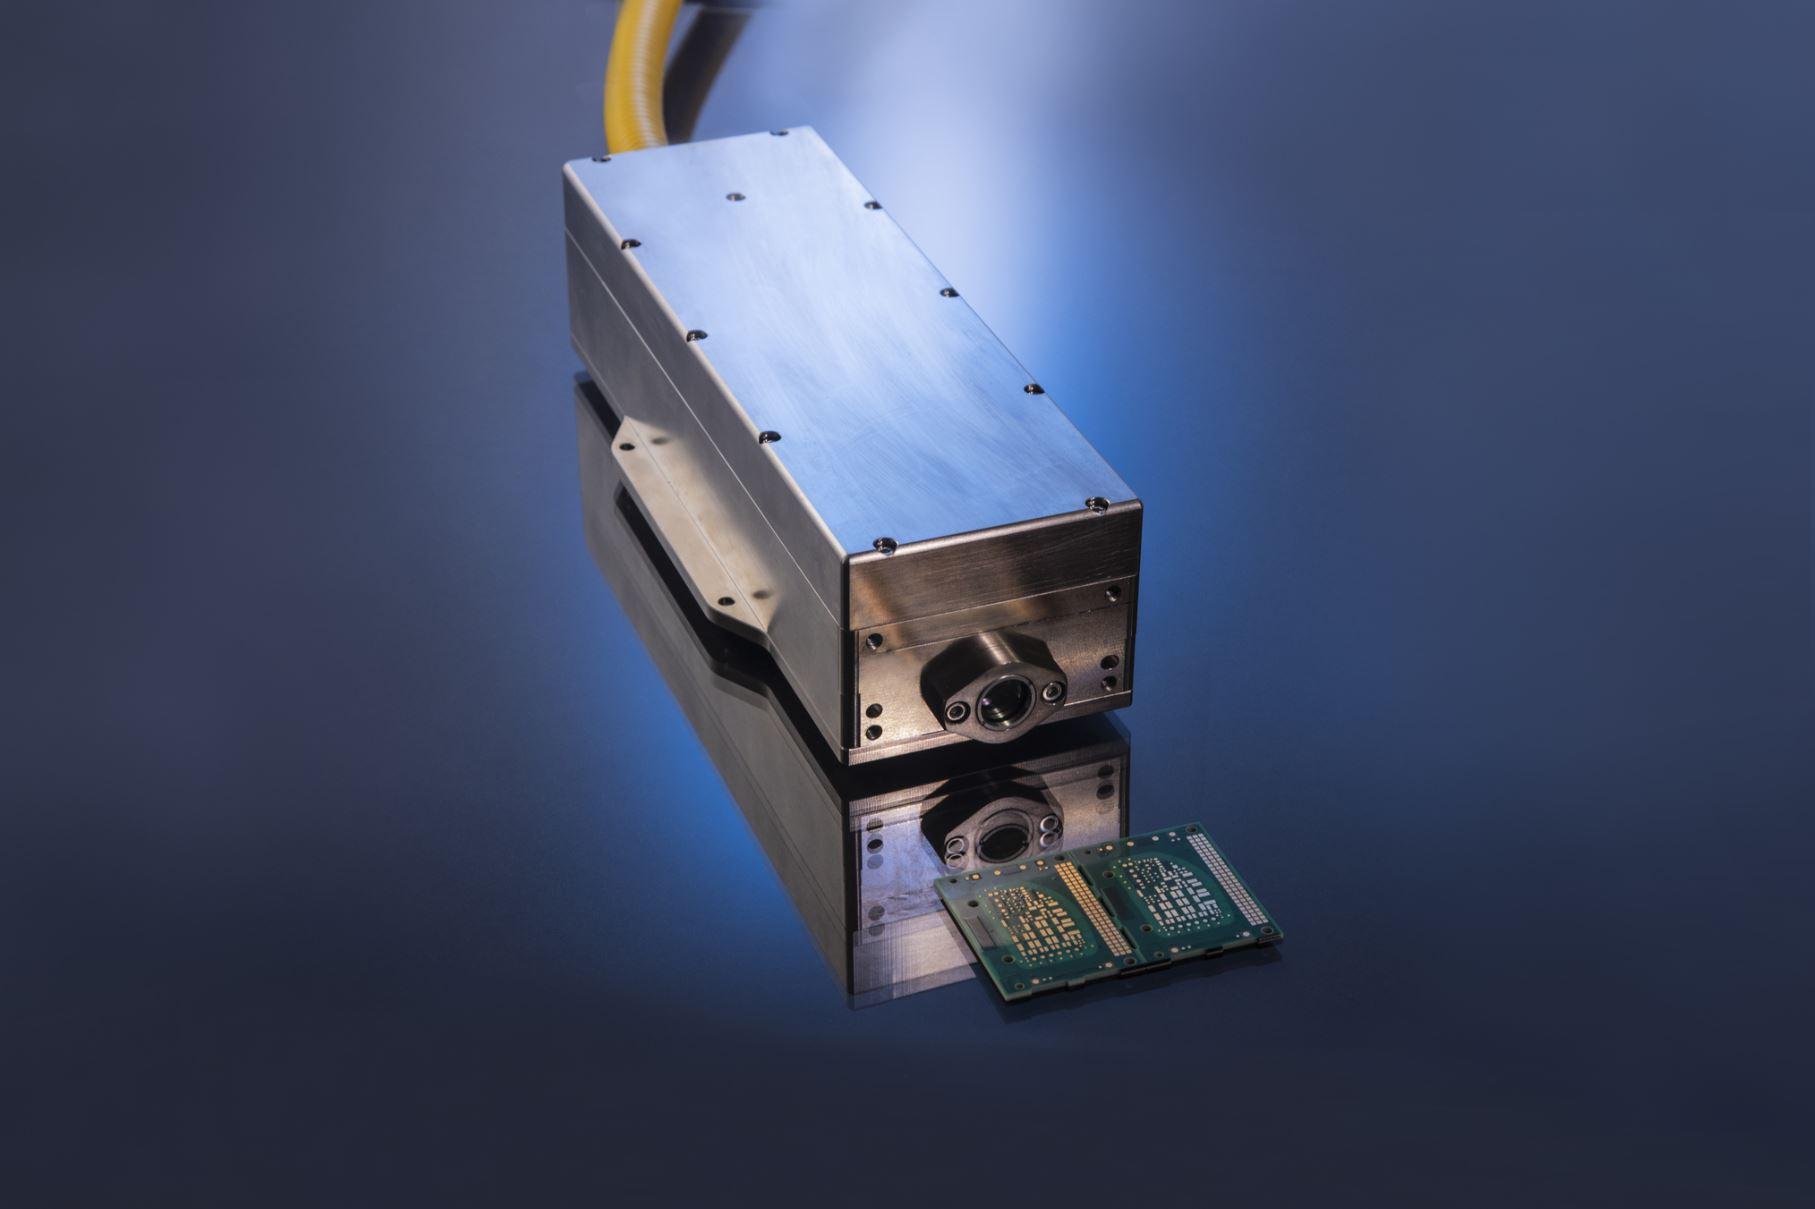 Innovative Fiber Laser Technology Powering IPG Laser Systems